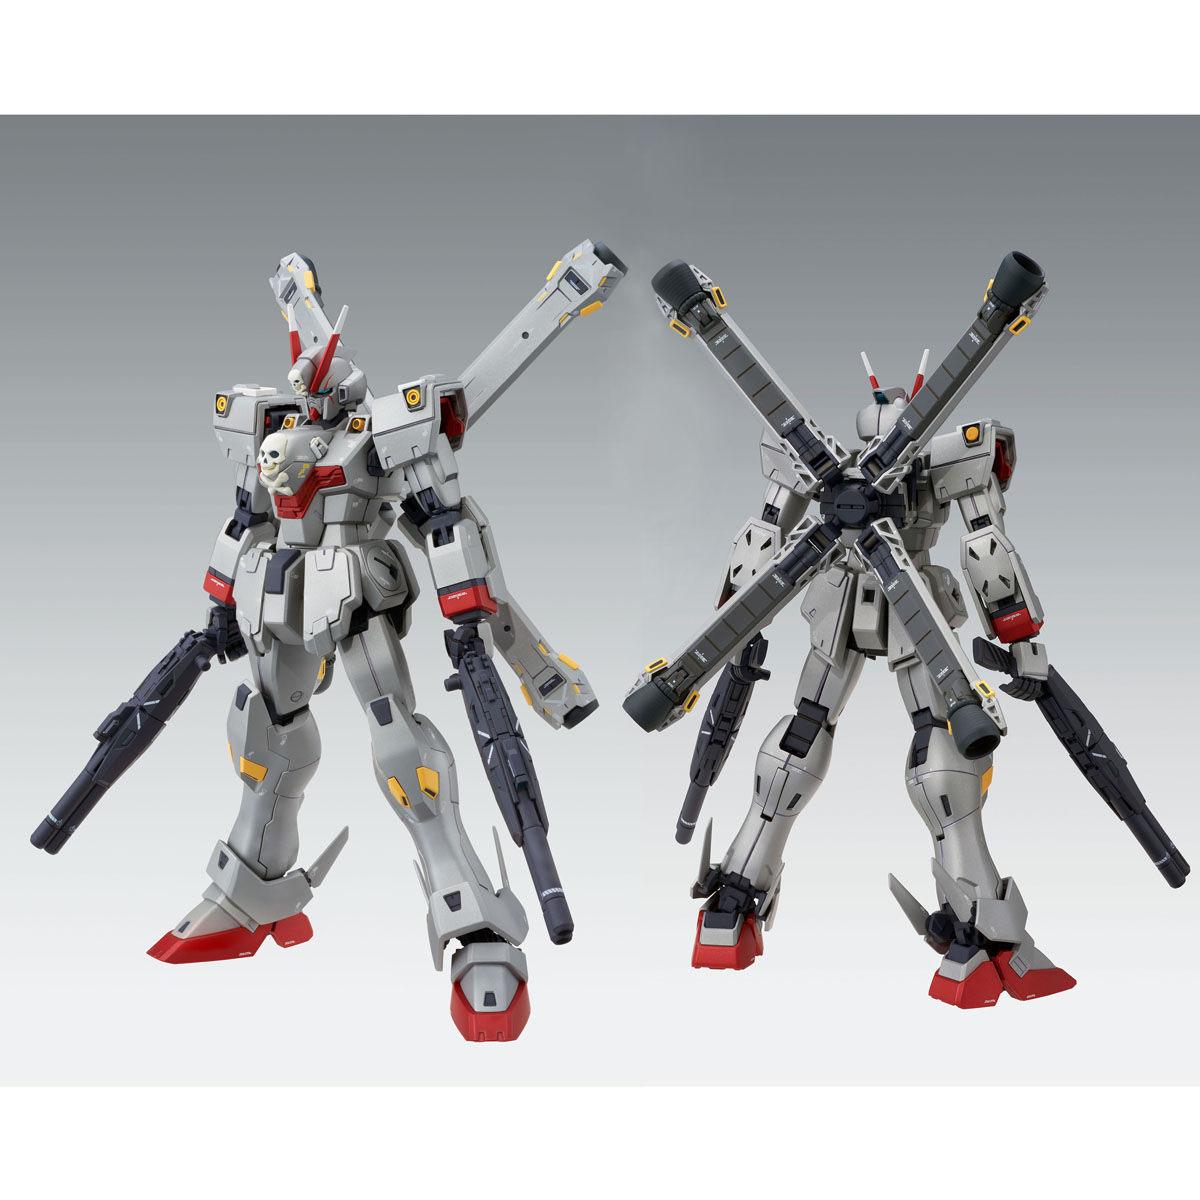 MG 1/100『クロスボーン・ガンダムX-0 Ver.Ka』プラモデル-007